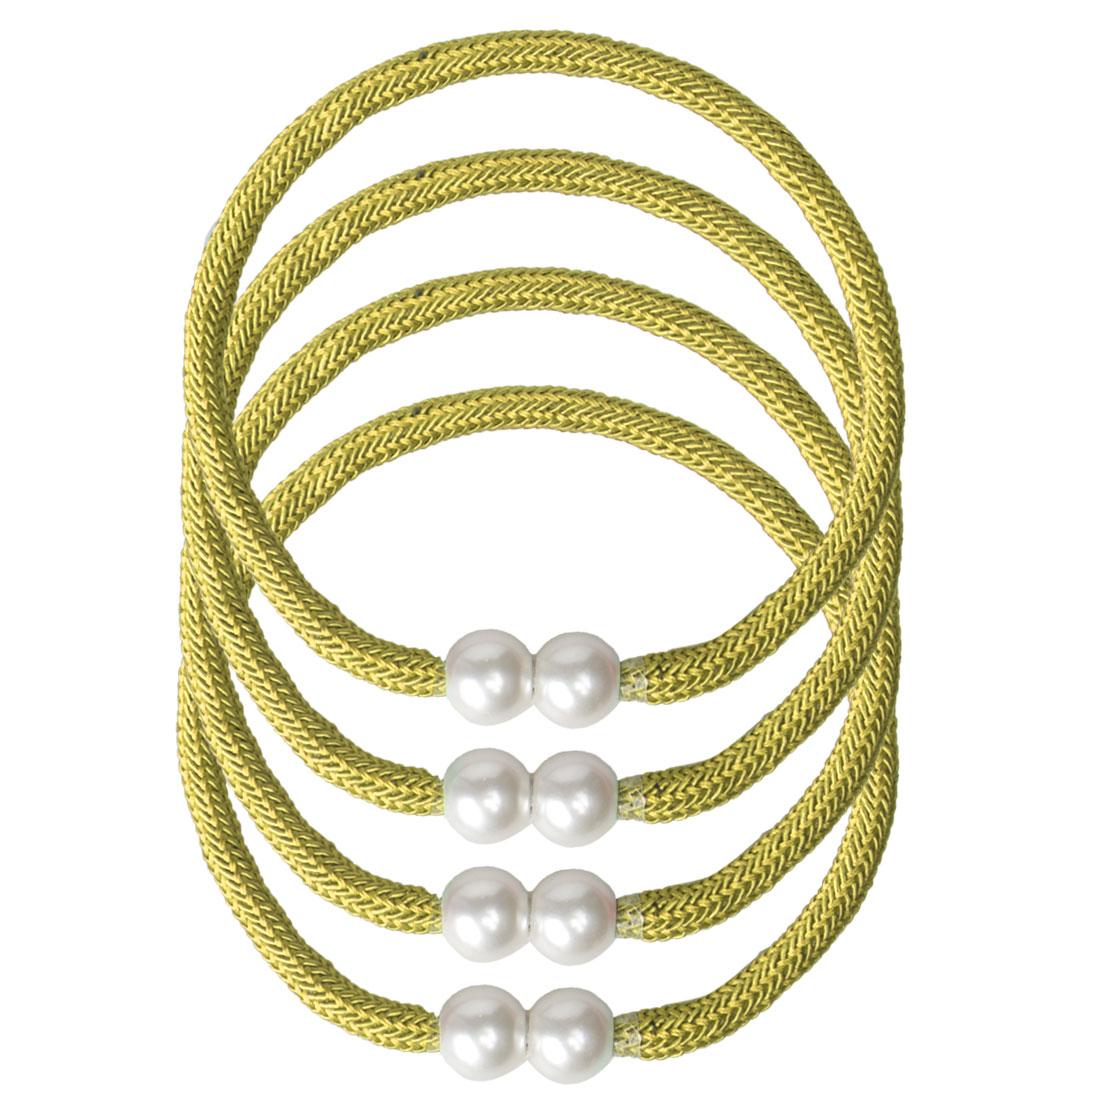 "4pcs Magnetic Curtain Tieback 18"" Holdback Decorative Rope Curtain, Yellow"